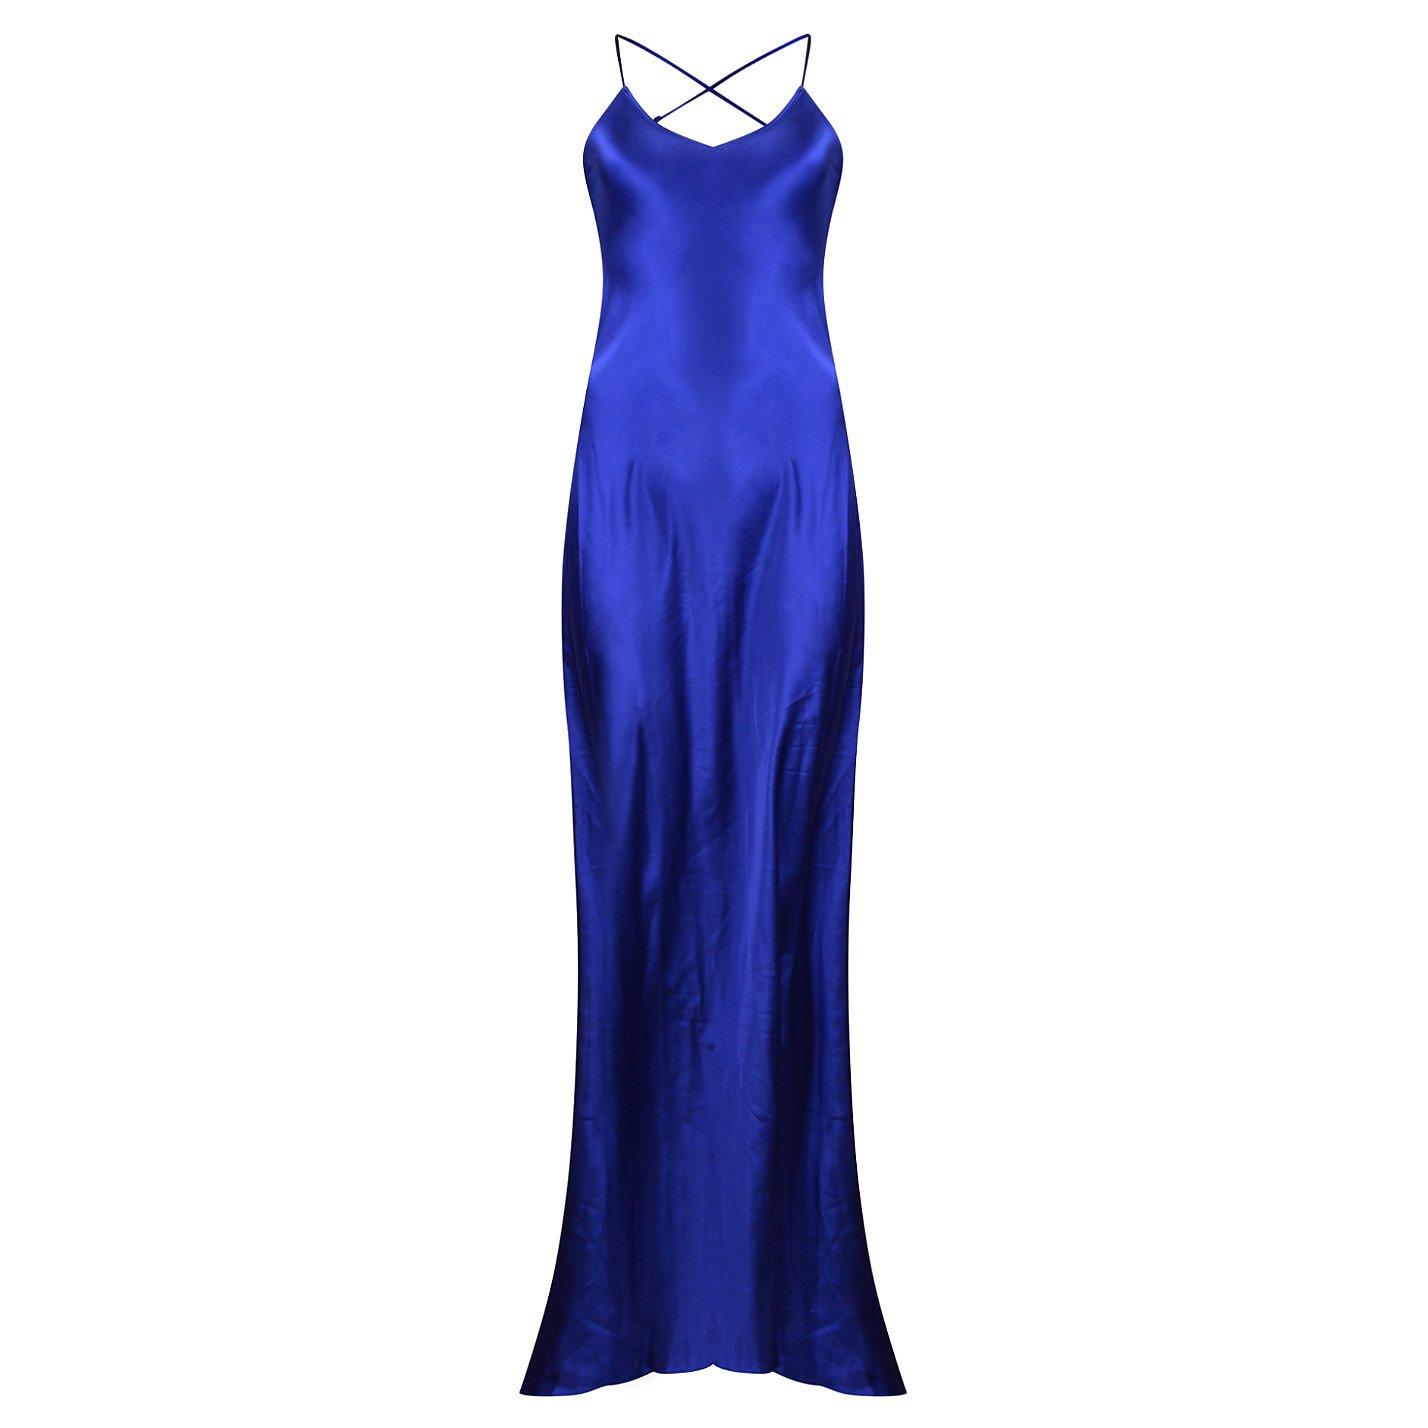 Olivia von Halle Perminova Silk Slip Dress